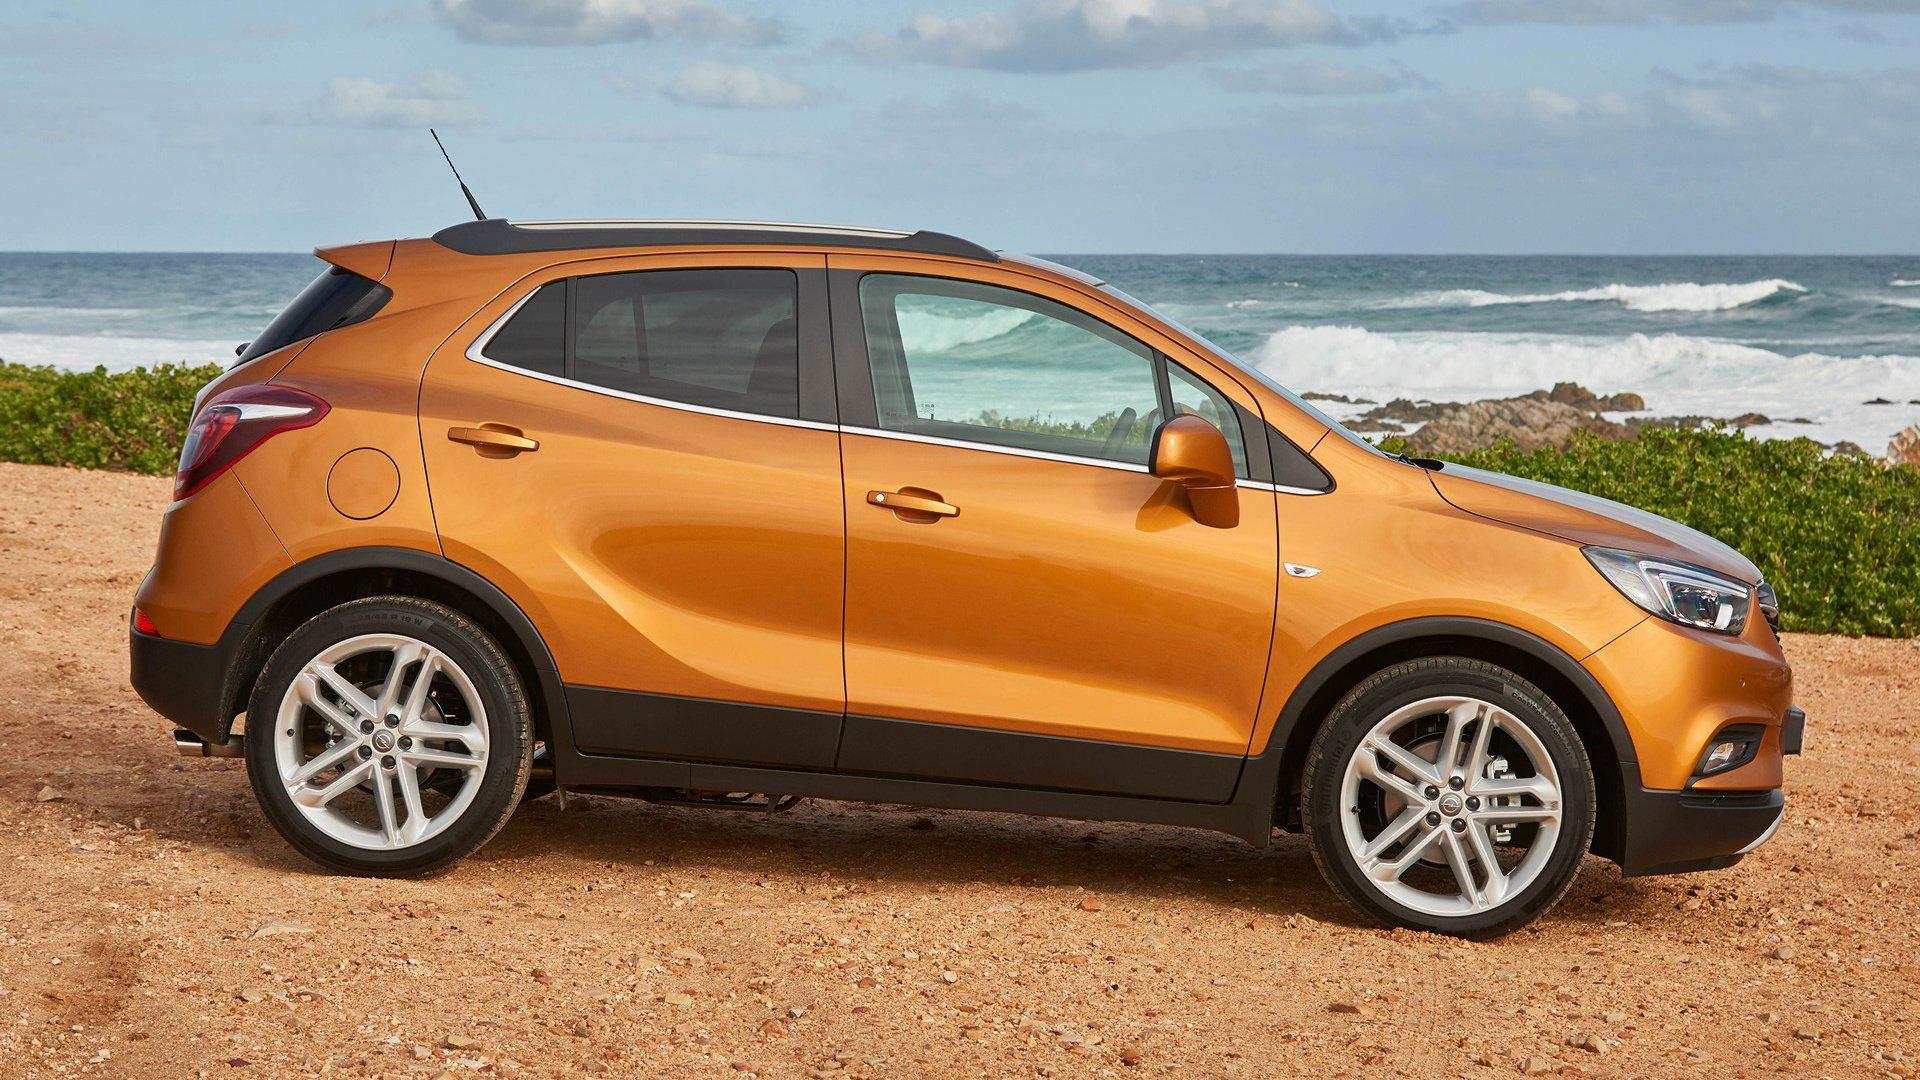 2016 Opel Mokka X Turbo Hd Wallpaper Background Image 1920x1080 Id 1100468 Wallpaper Abyss